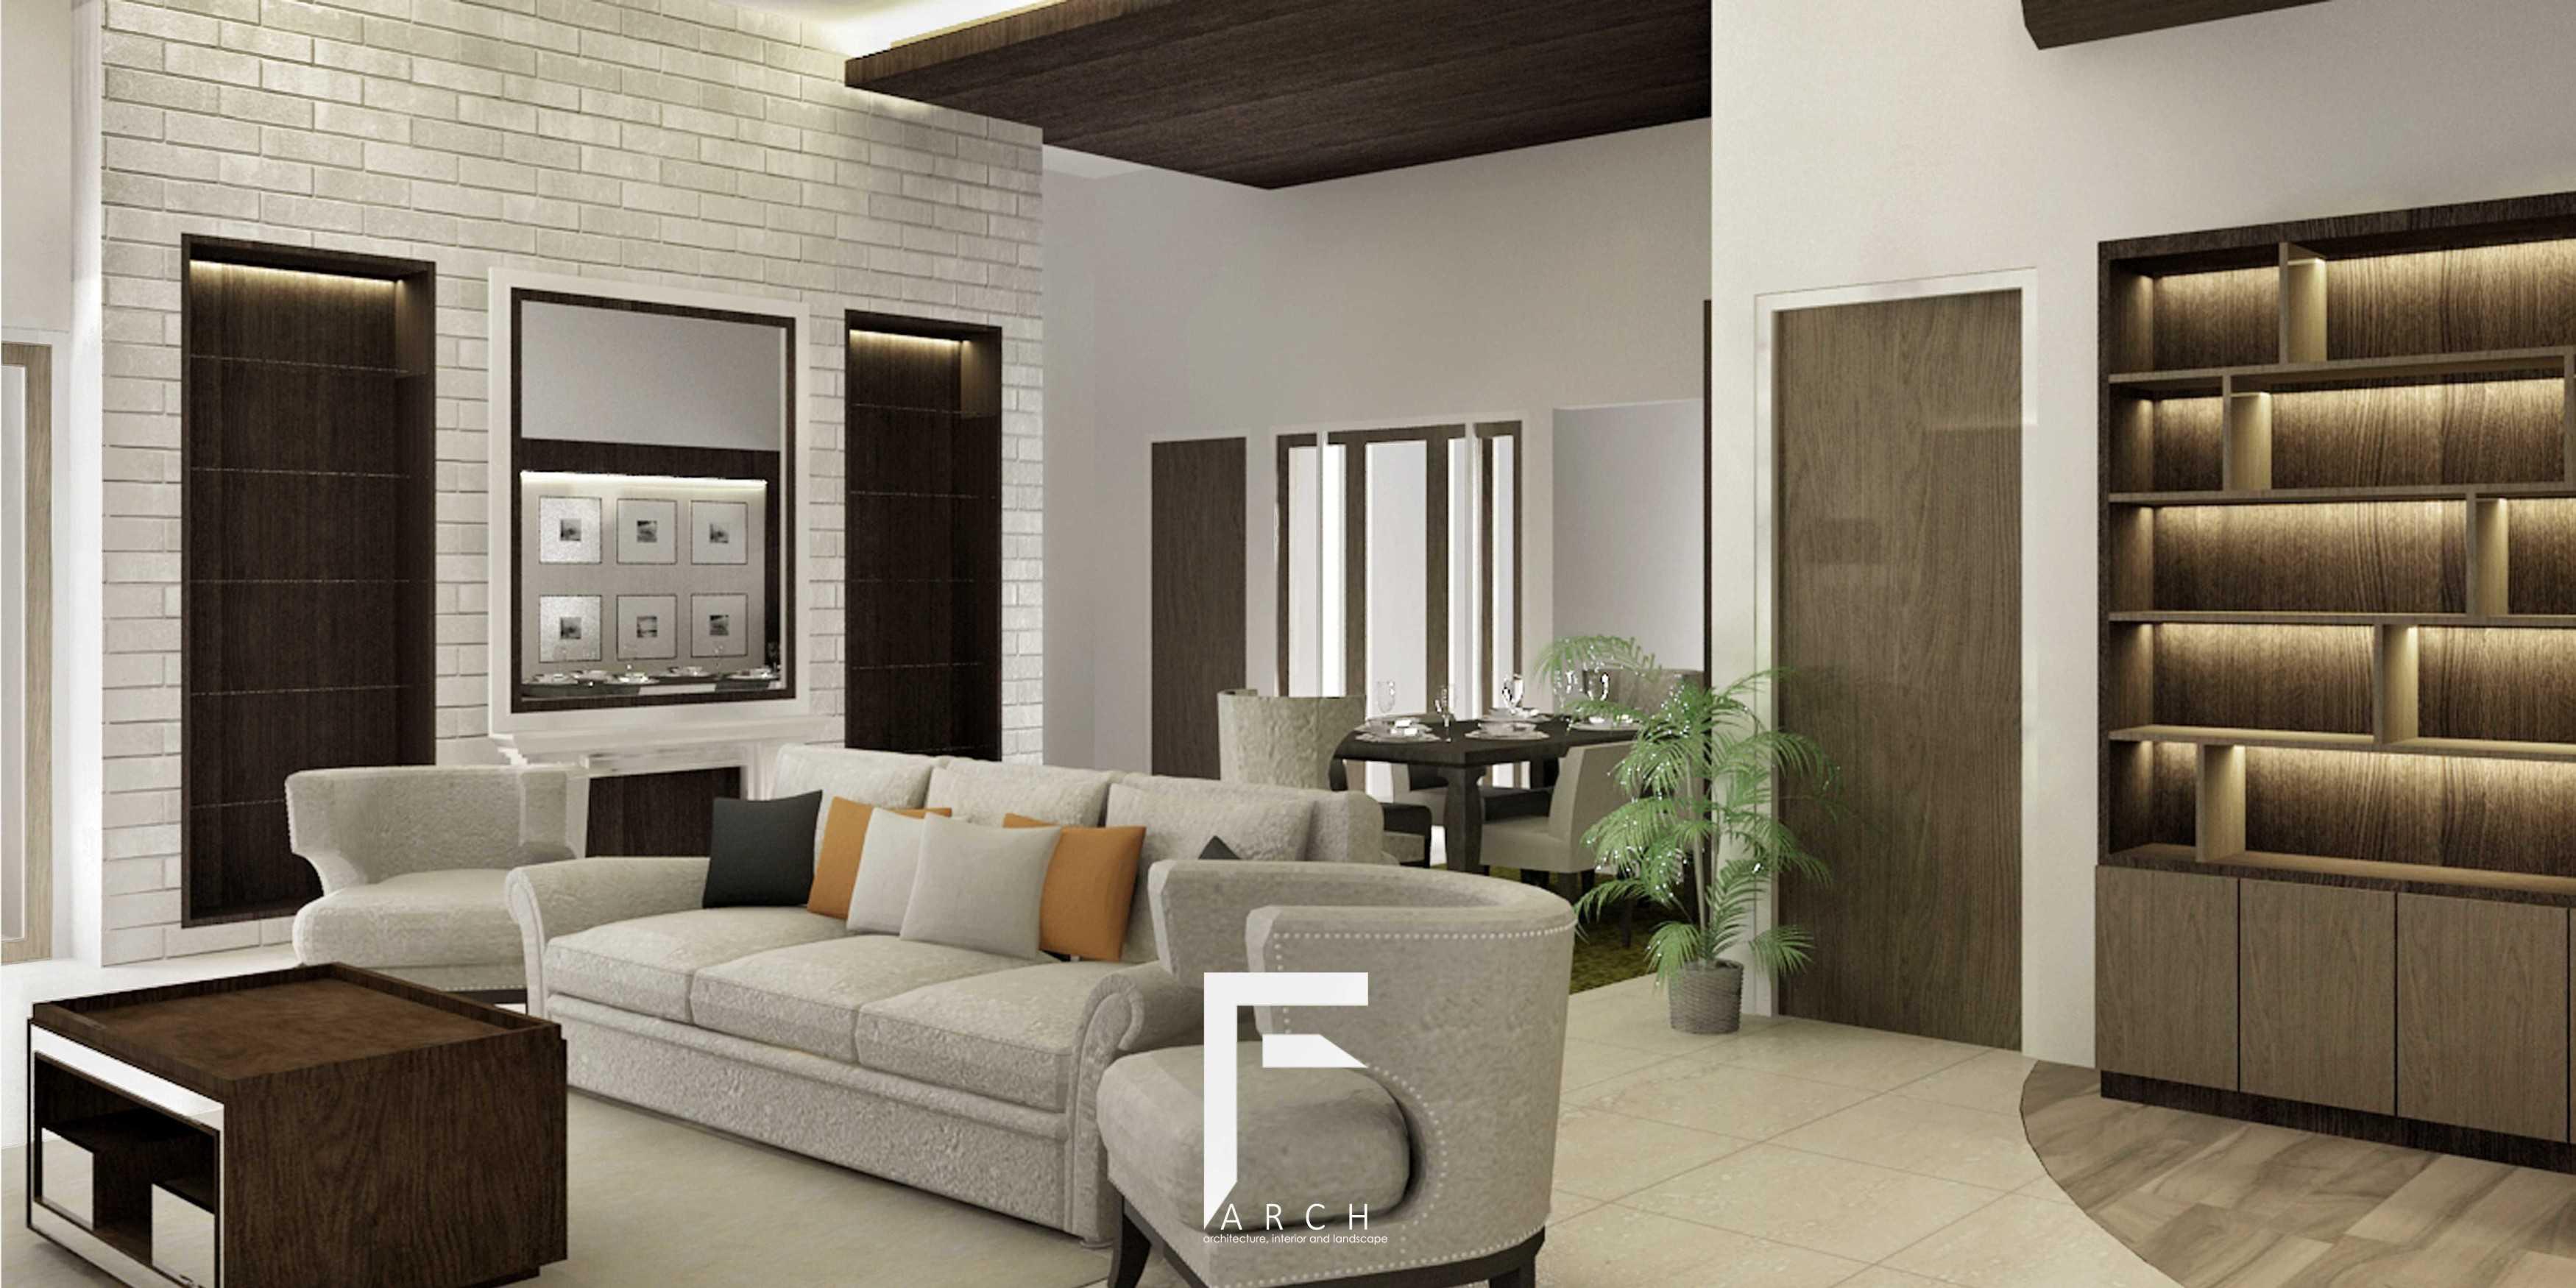 Forr Arch Modern Home Interior Design  Demak Regency, Central Java, Indonesia 9-01   30458